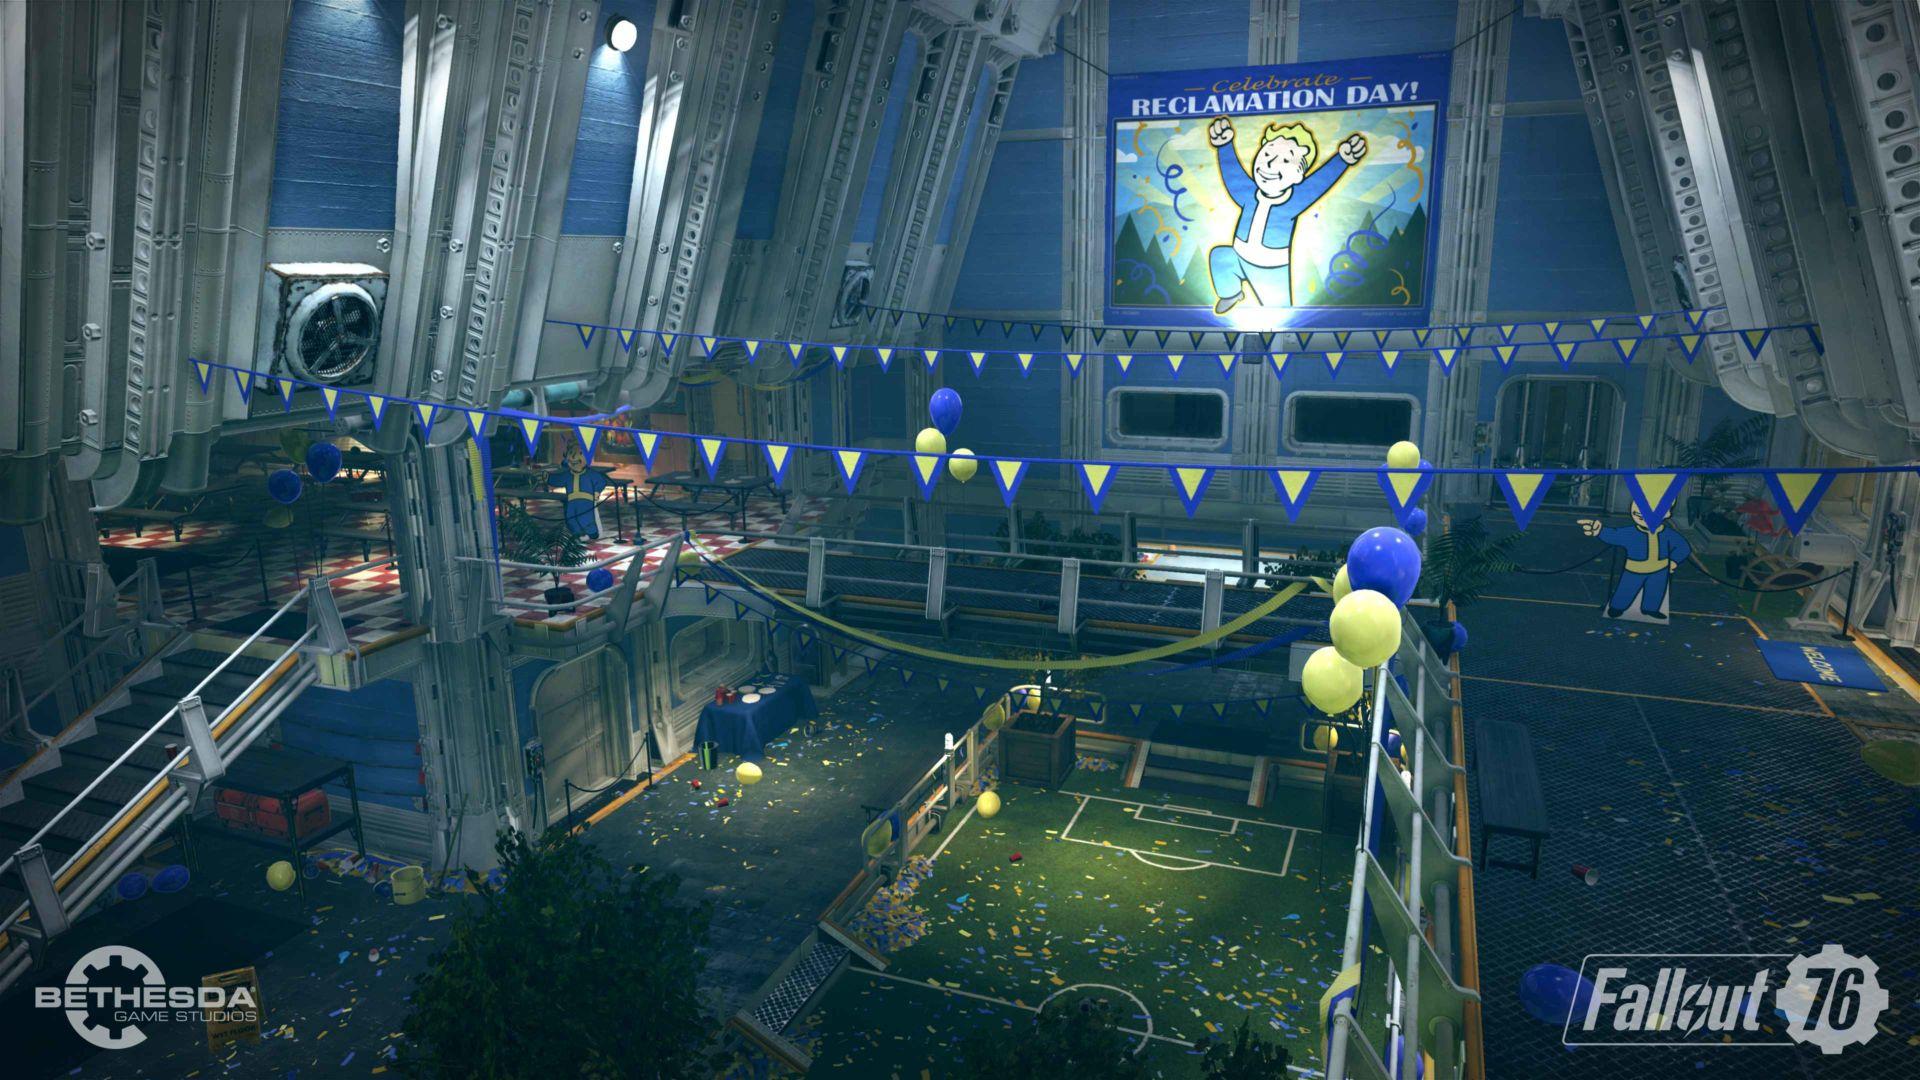 Bethesda annuncia Fallout 76, un nuovo misterioso titolo